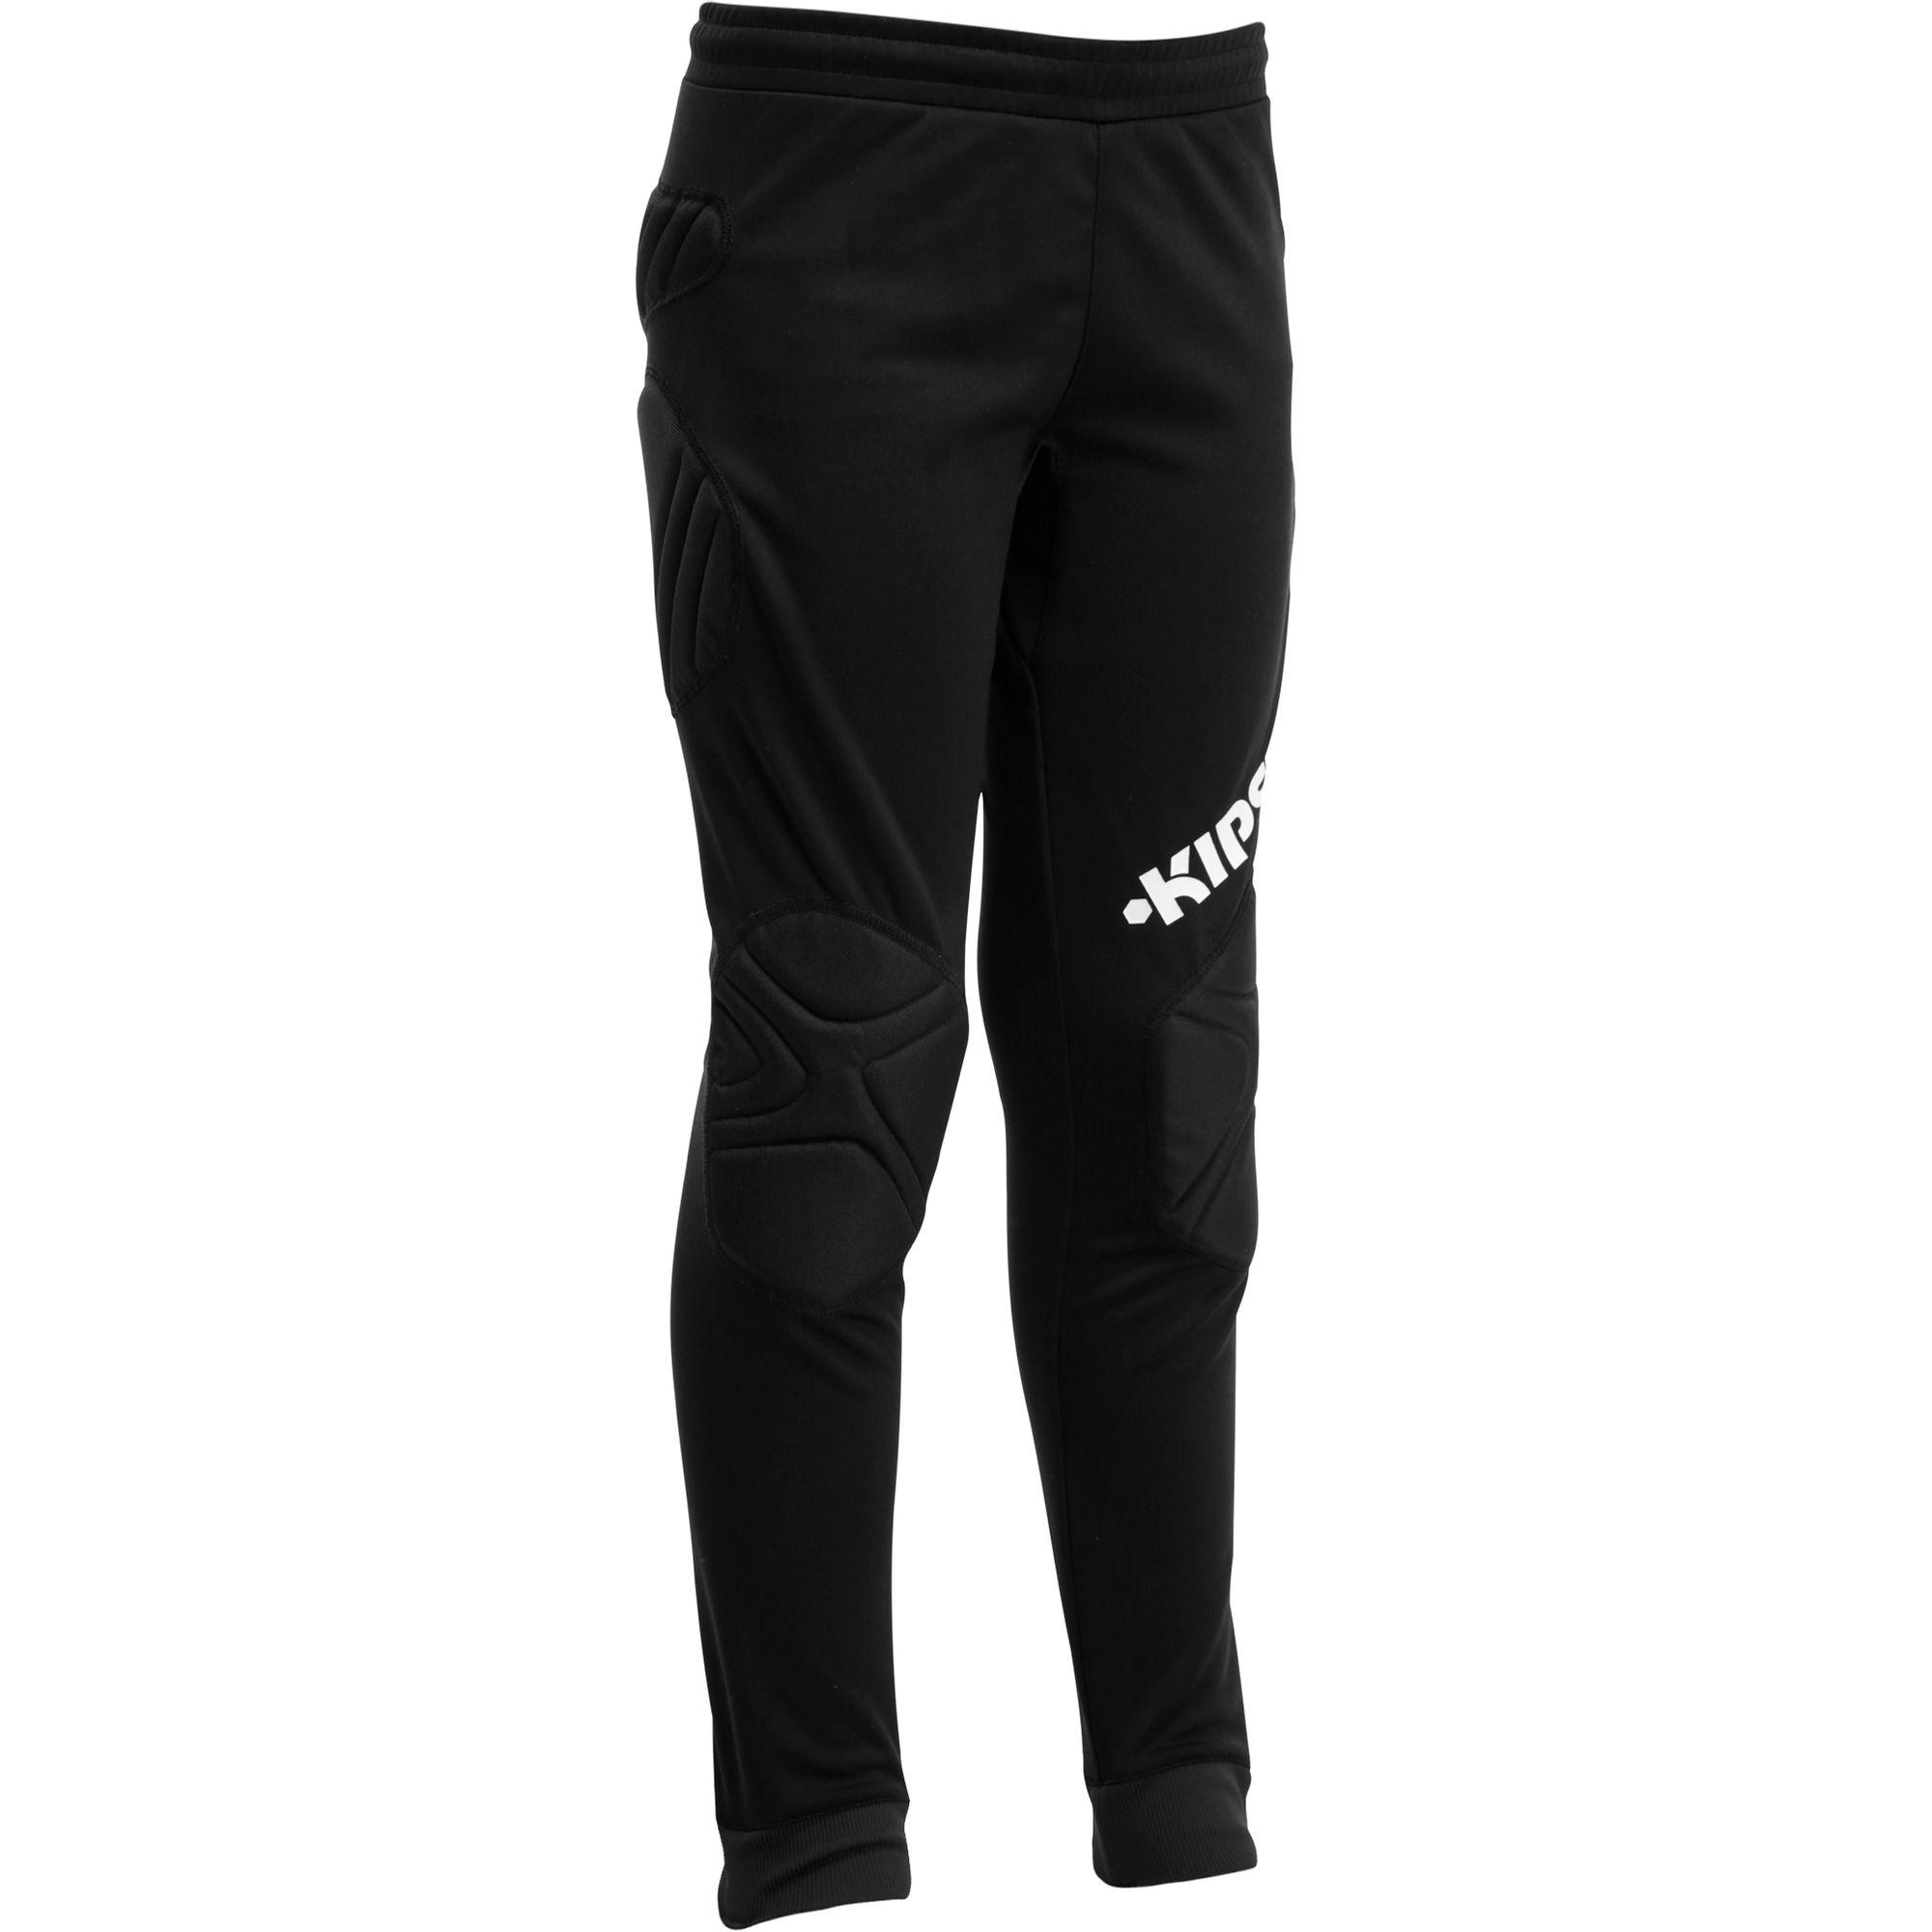 Pantalon gardien football enfant F300 noir